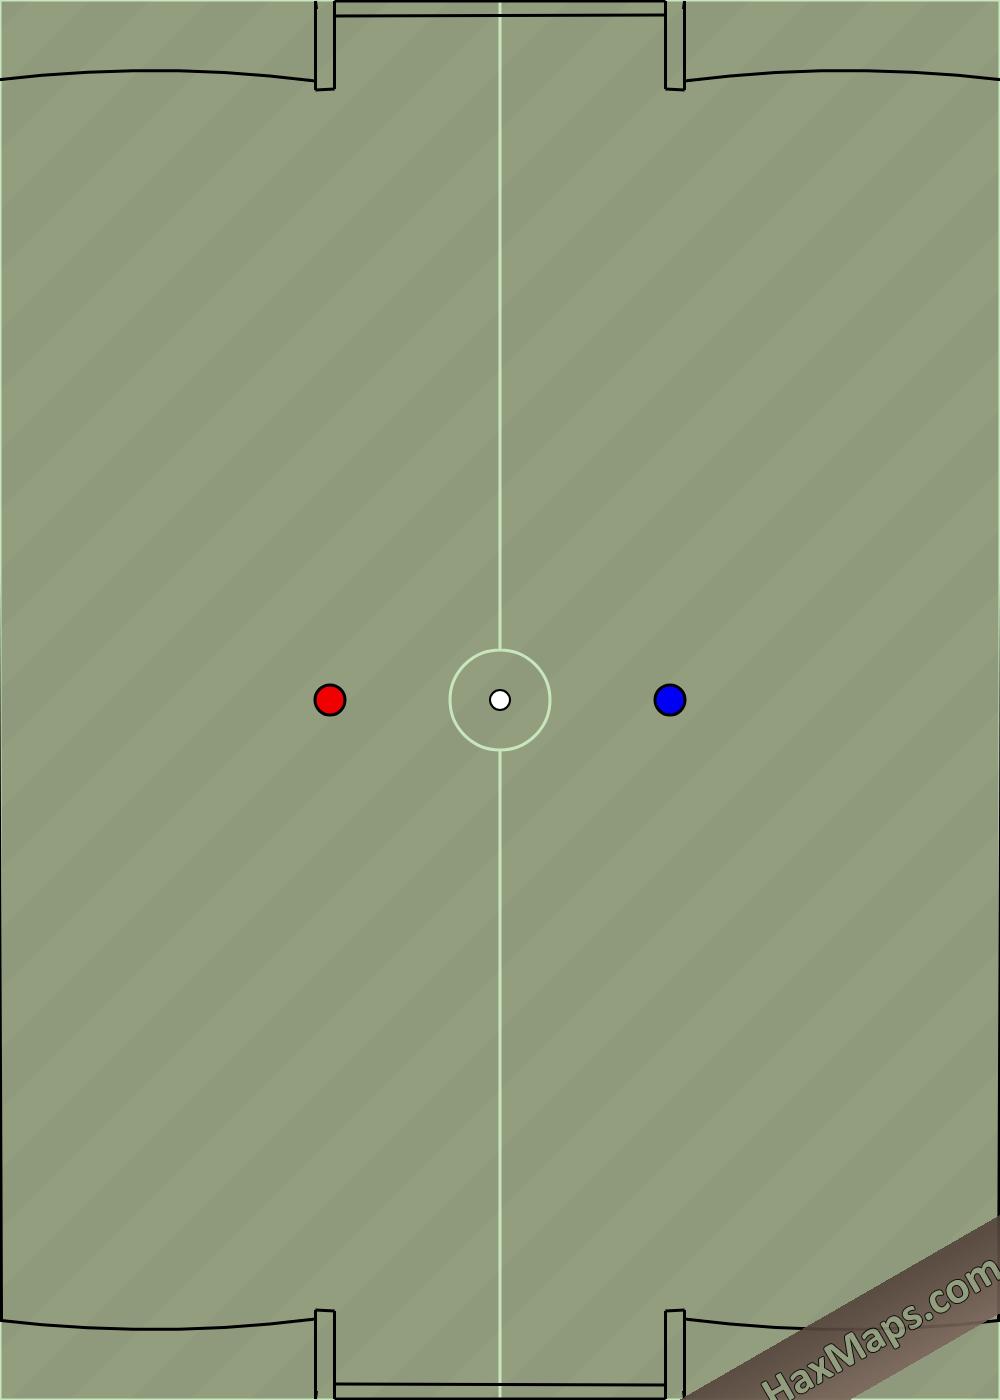 hax ball maps | Vertical Fun Soccer